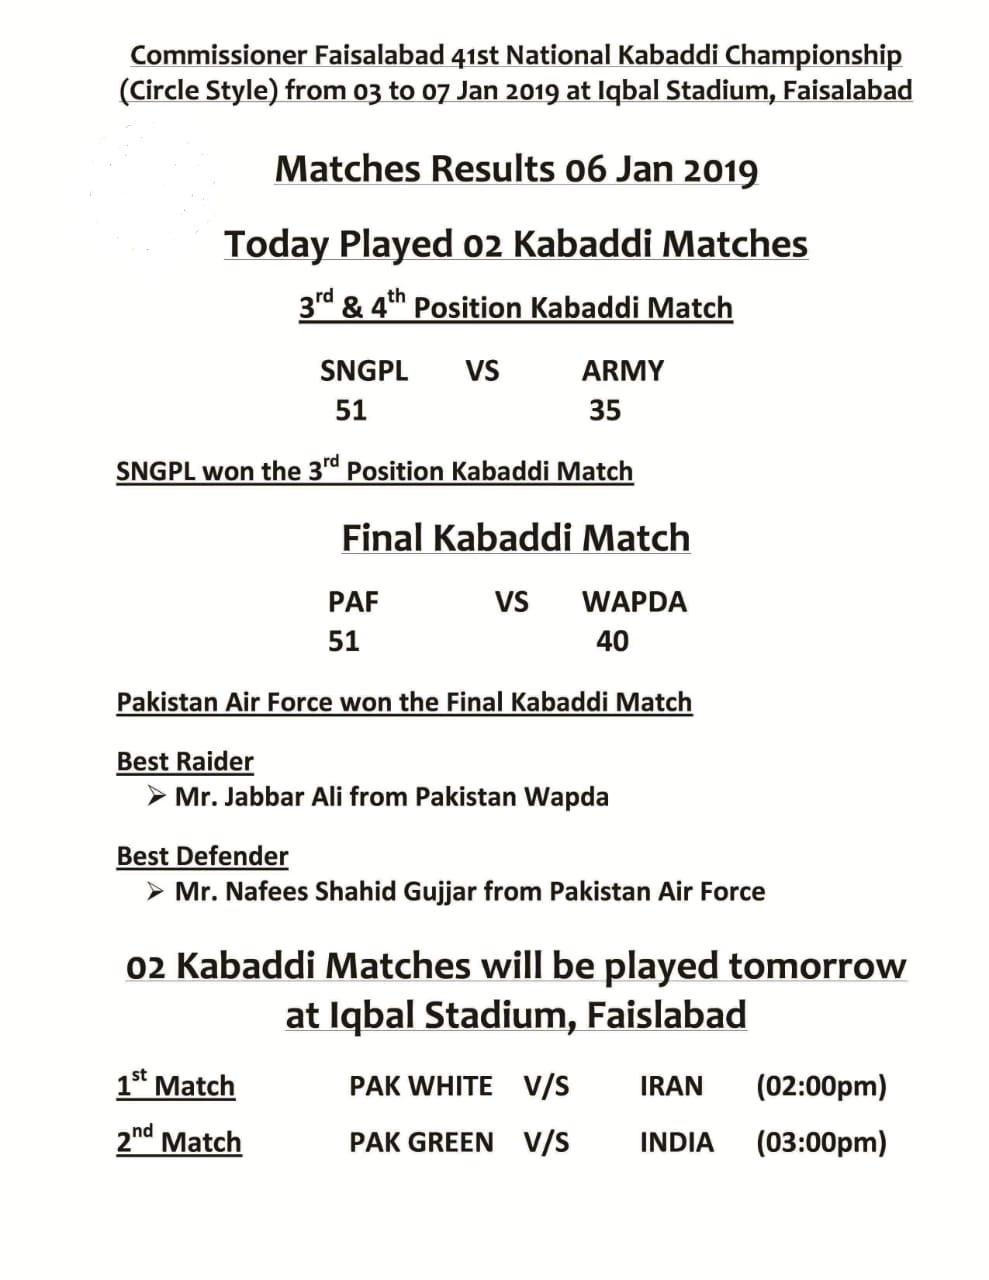 National Kabbadi Championship 2019